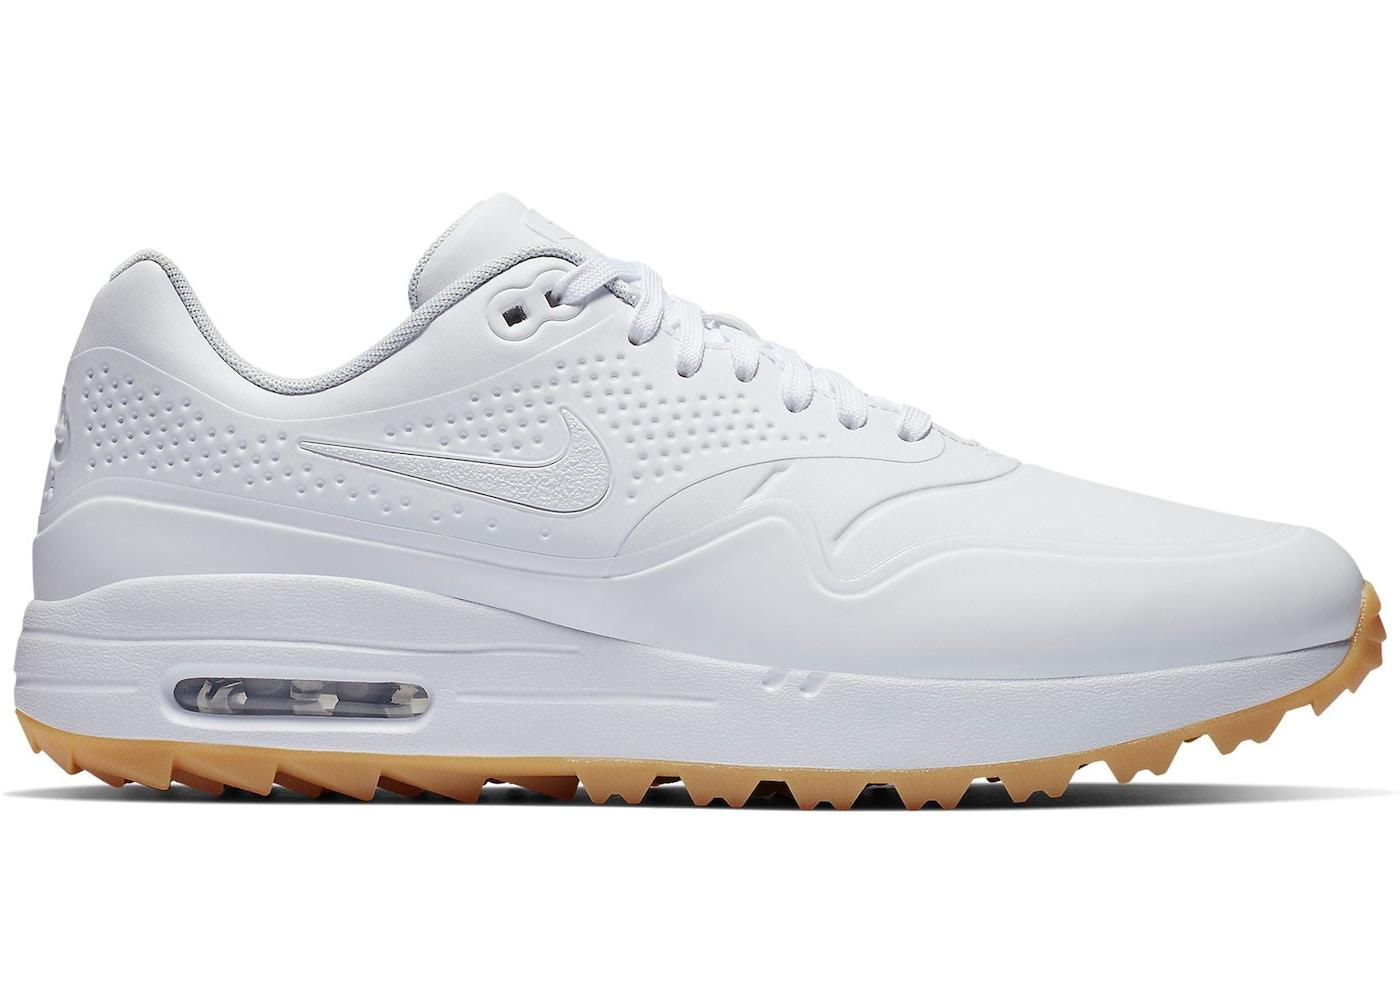 low priced 8a835 03aad Air Max 1 Golf White Gum